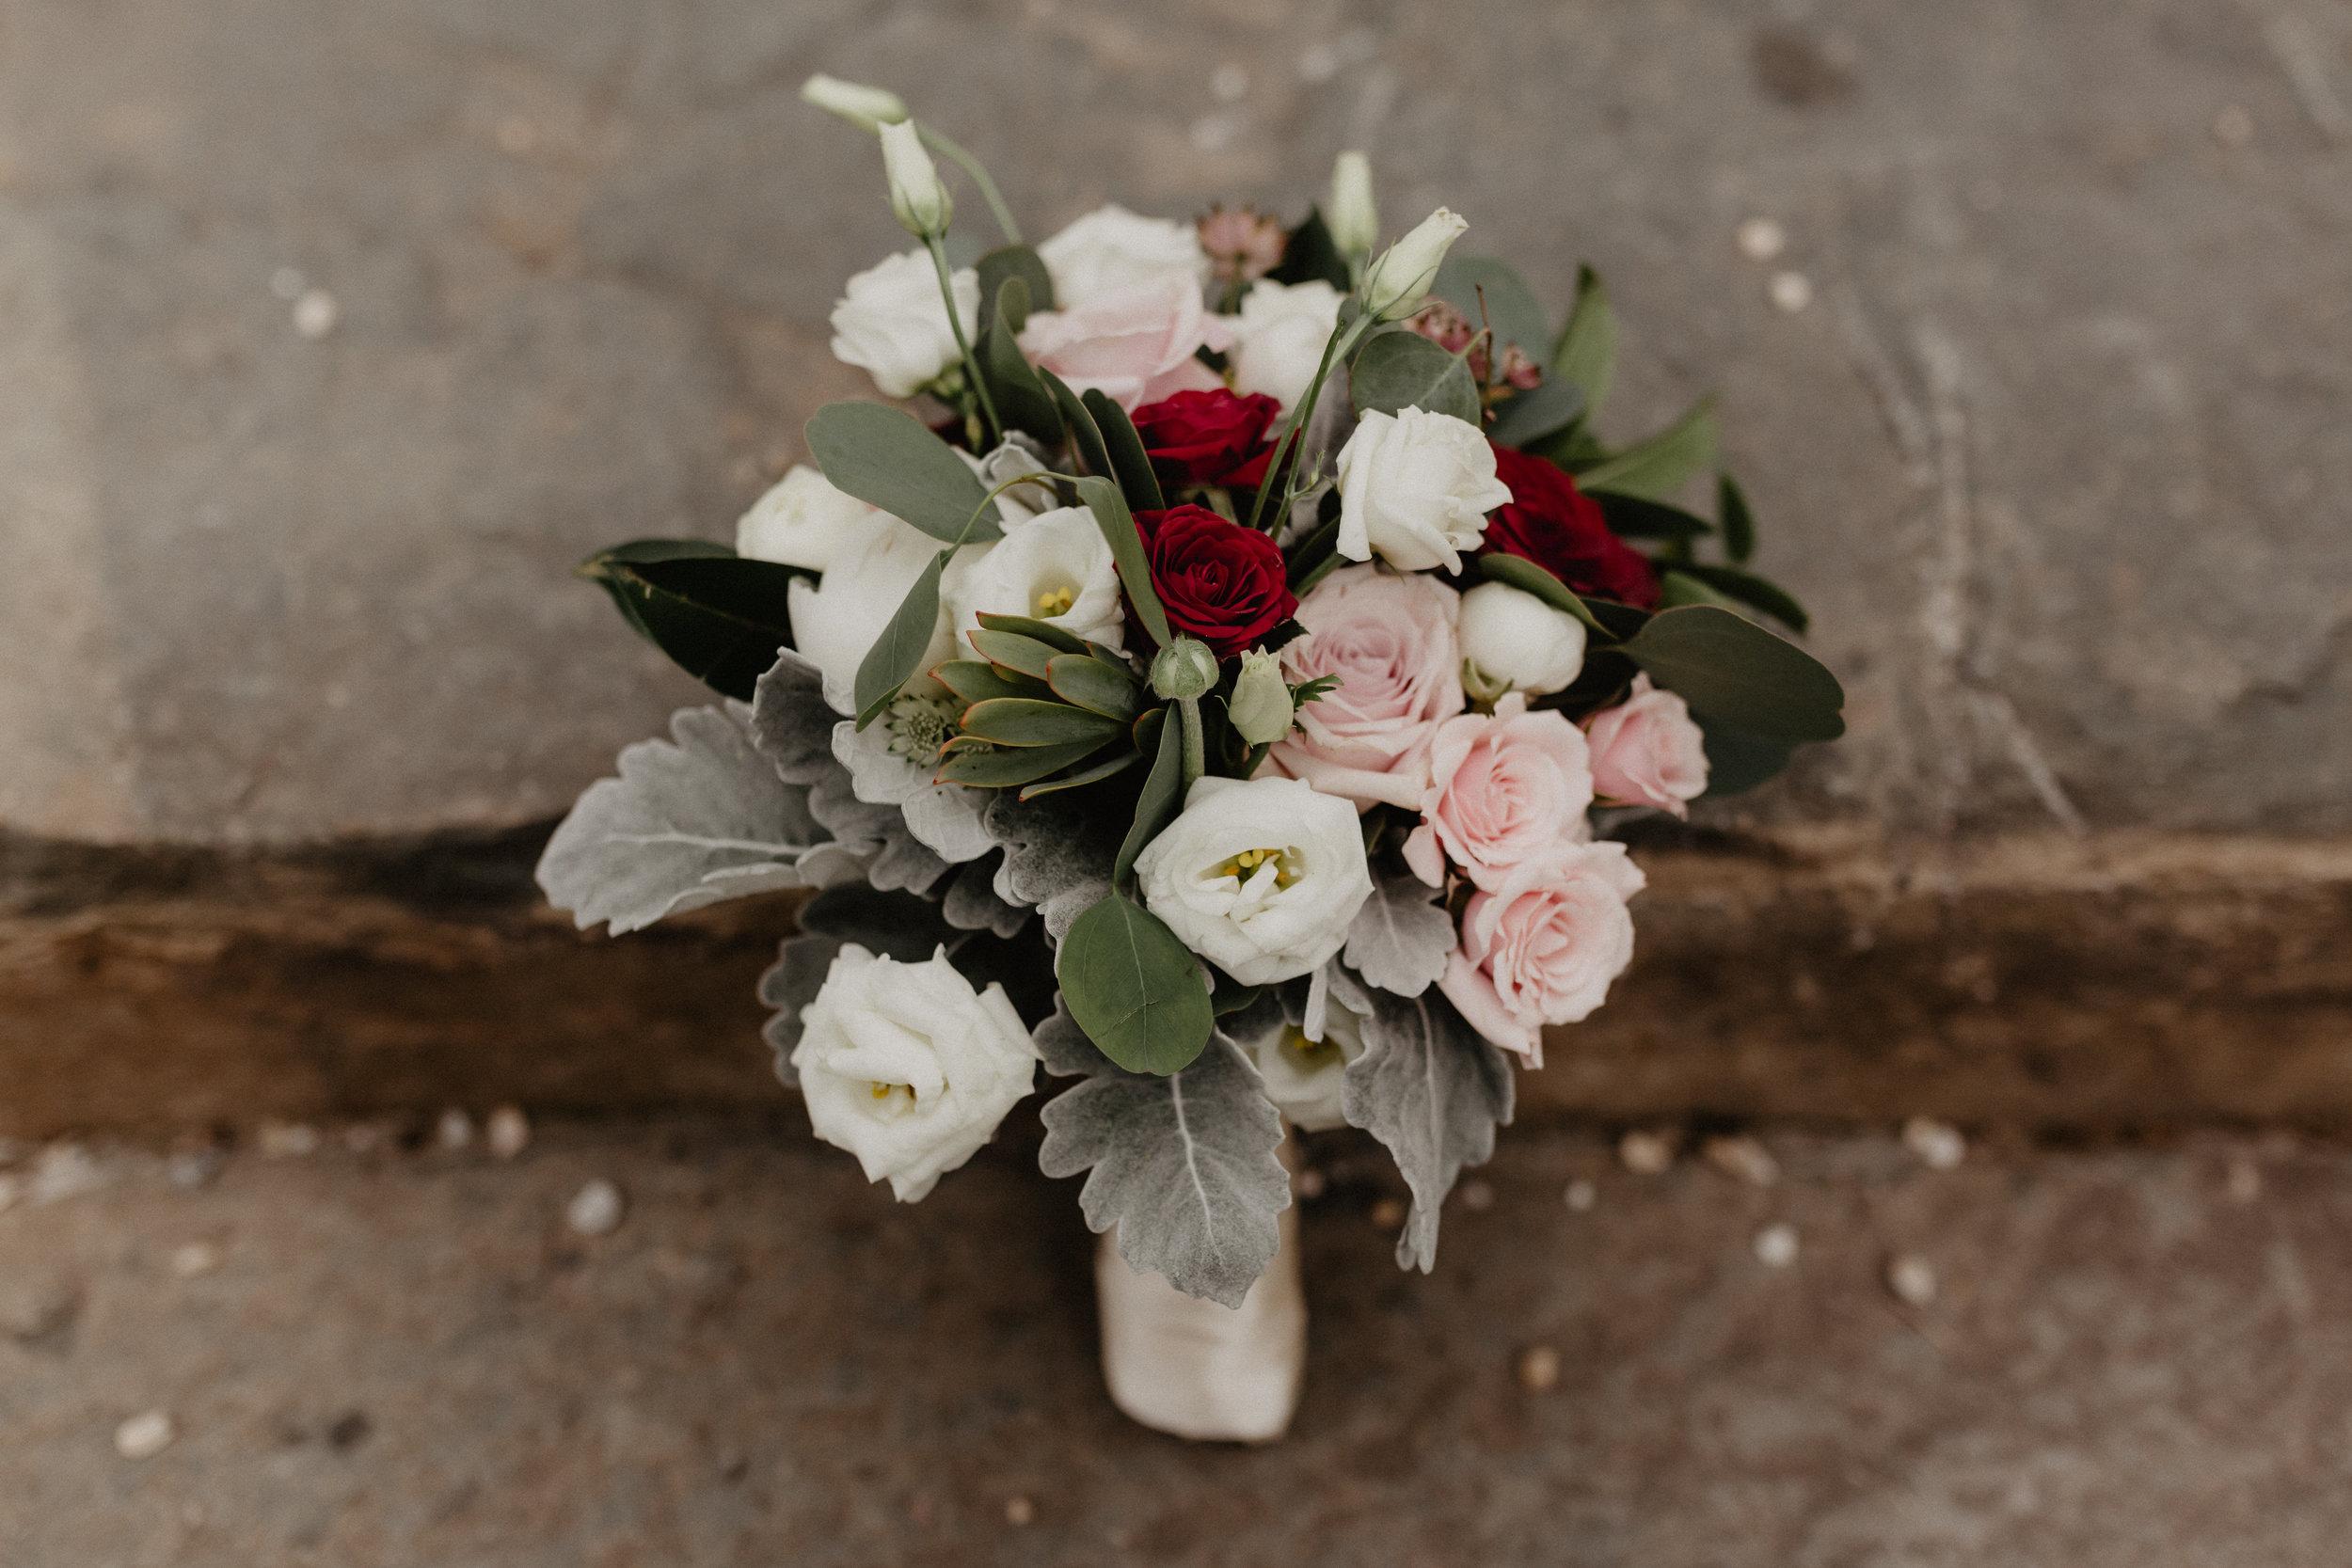 greywacke-meadows-wedding_012.jpg